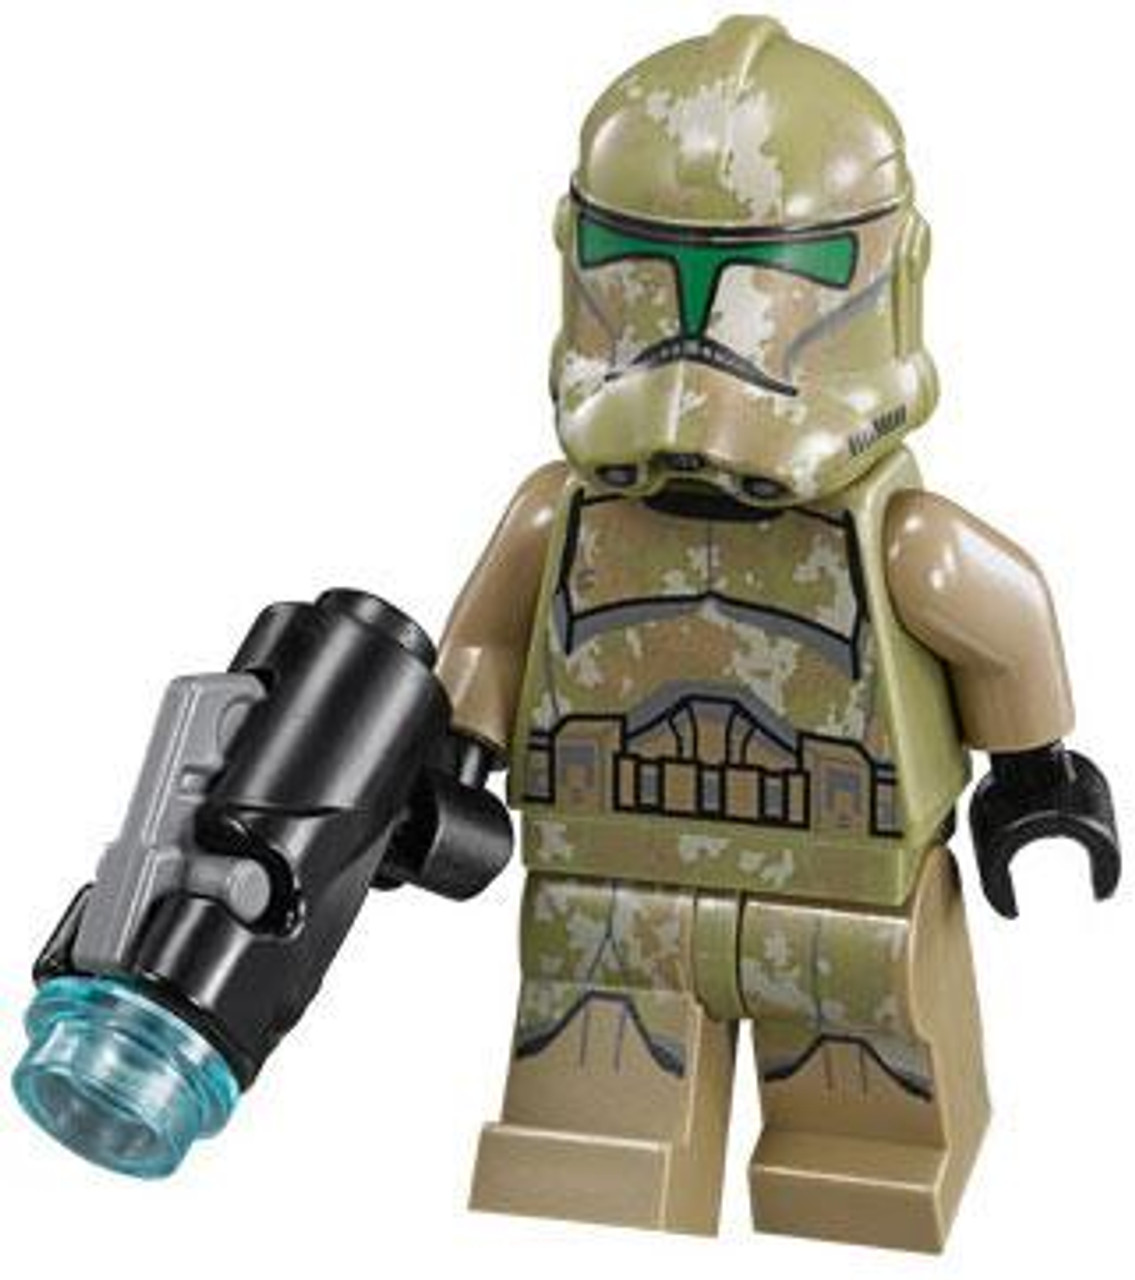 LEGO Star Wars Loose Kashyyyk Clone Trooper Minifigure [Loose]